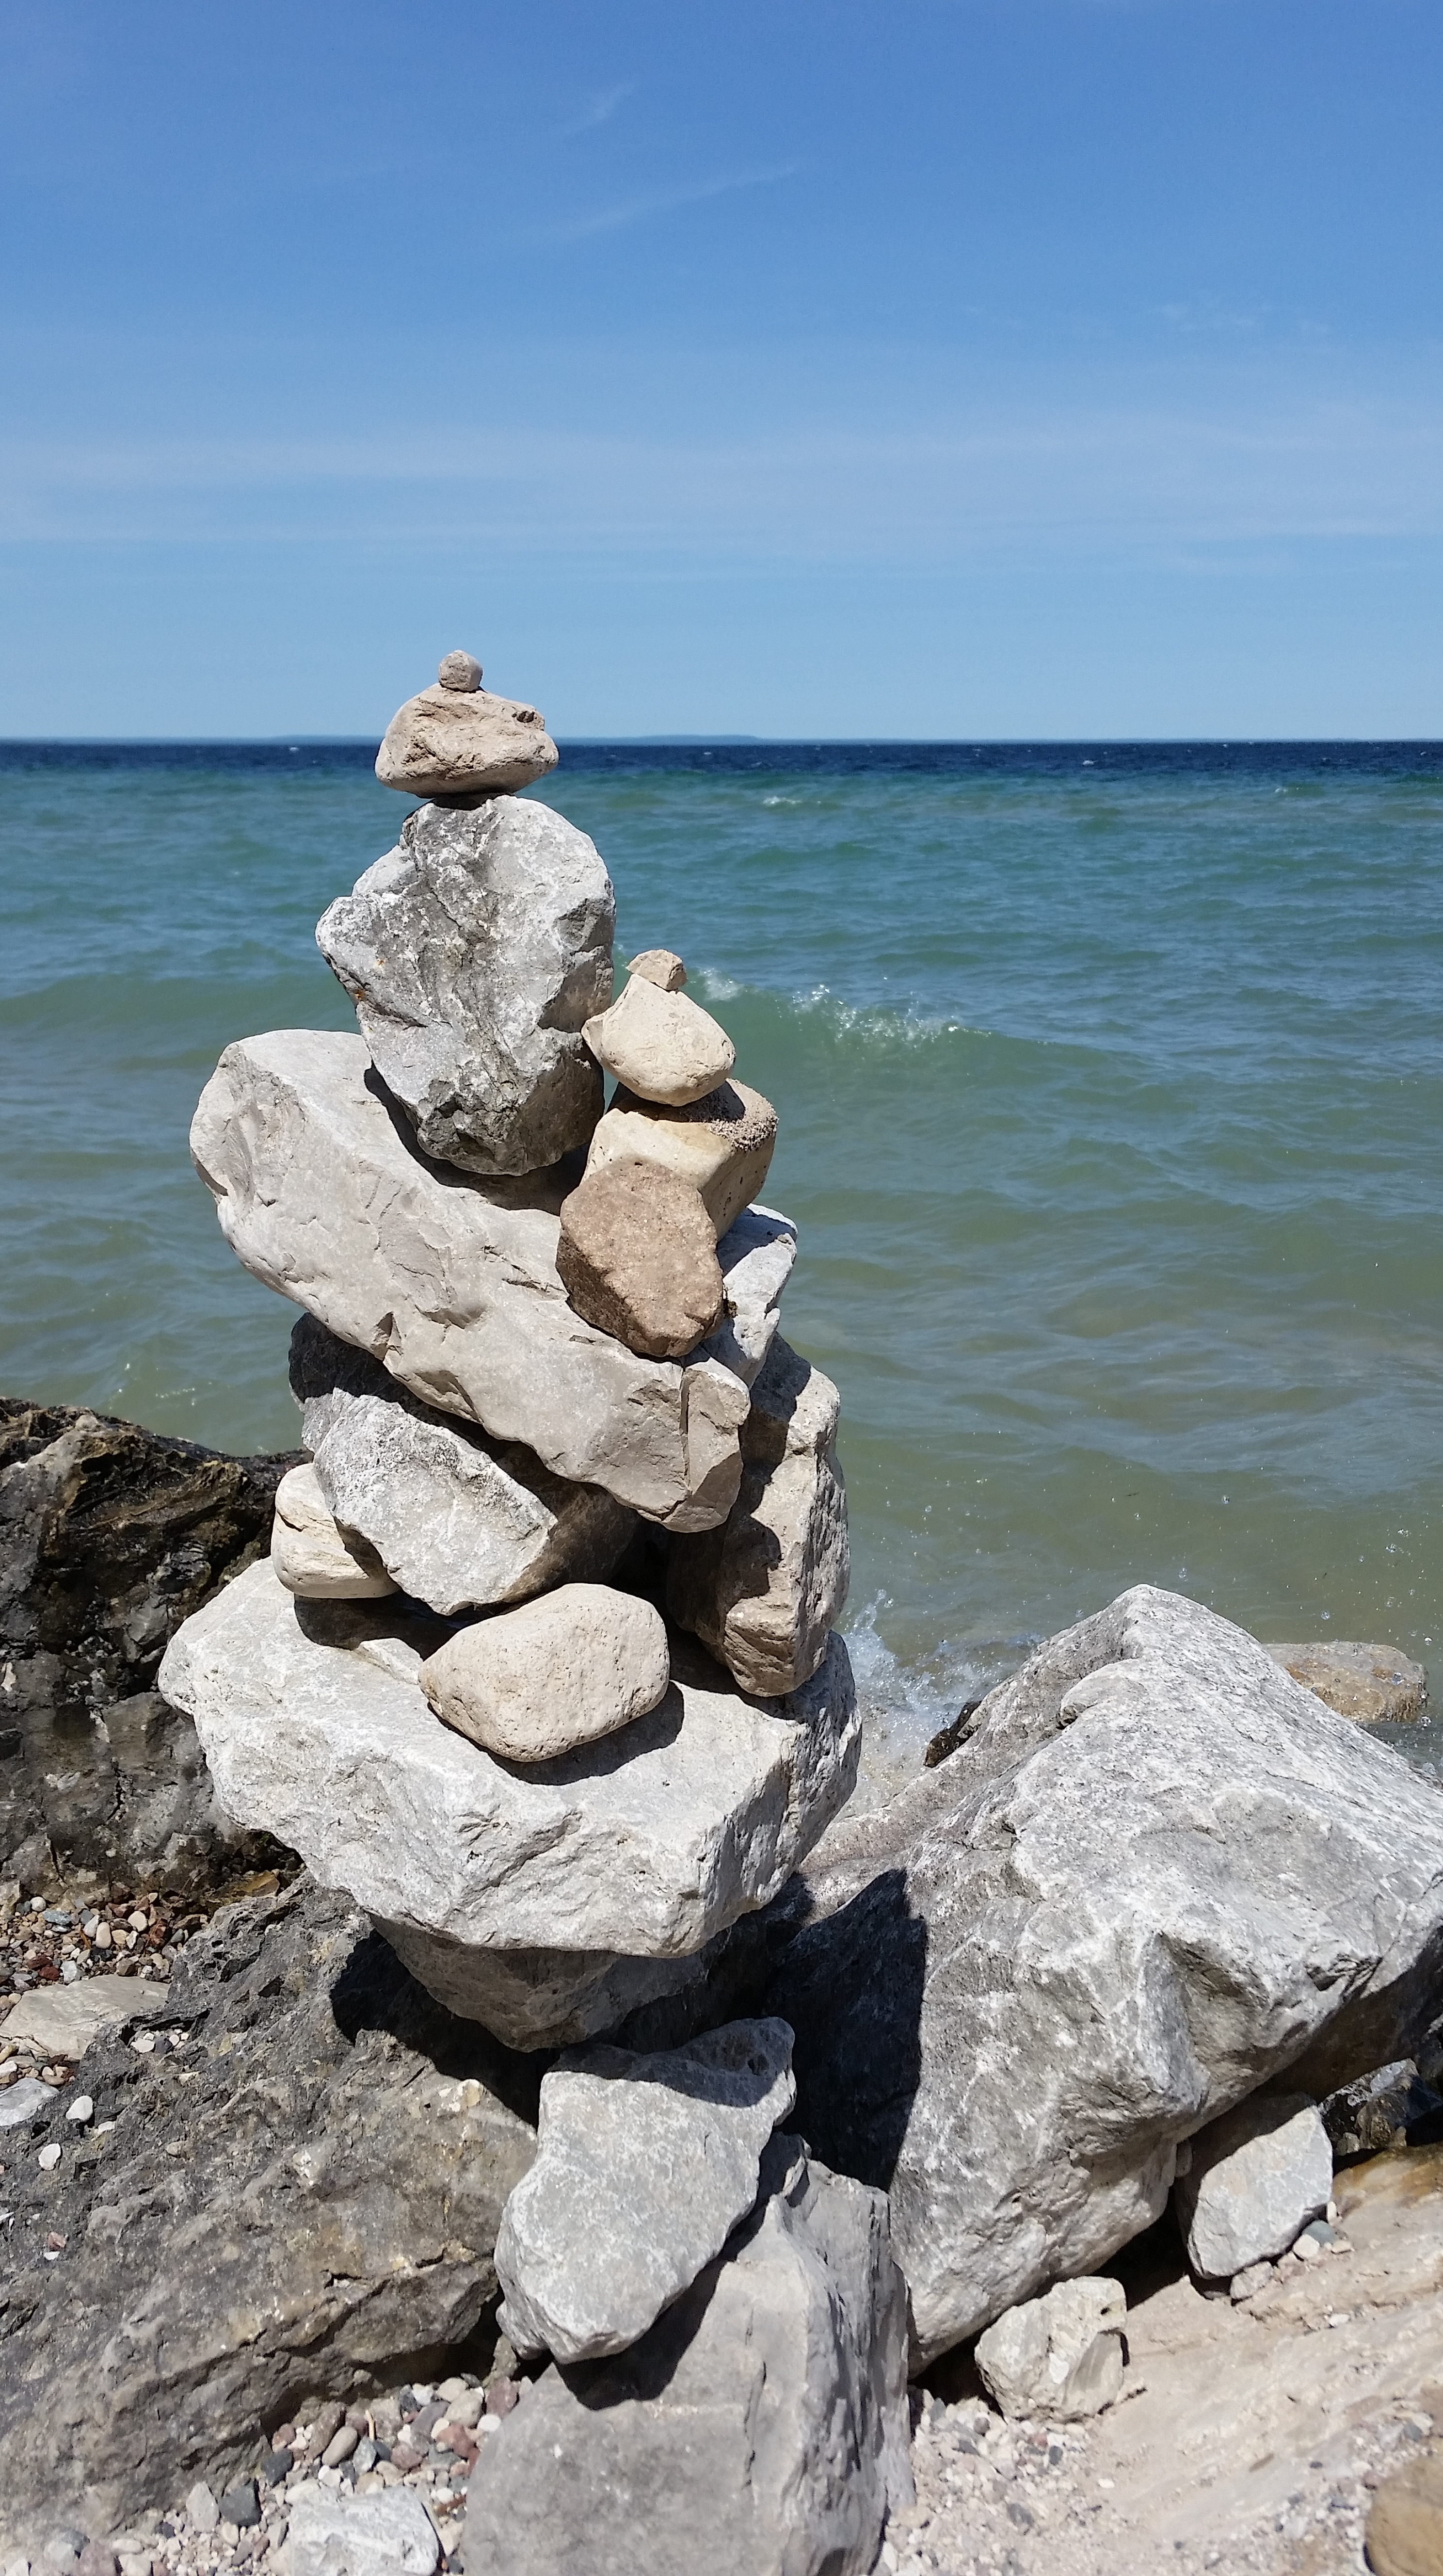 A stack of rocks next to Lake Huron.